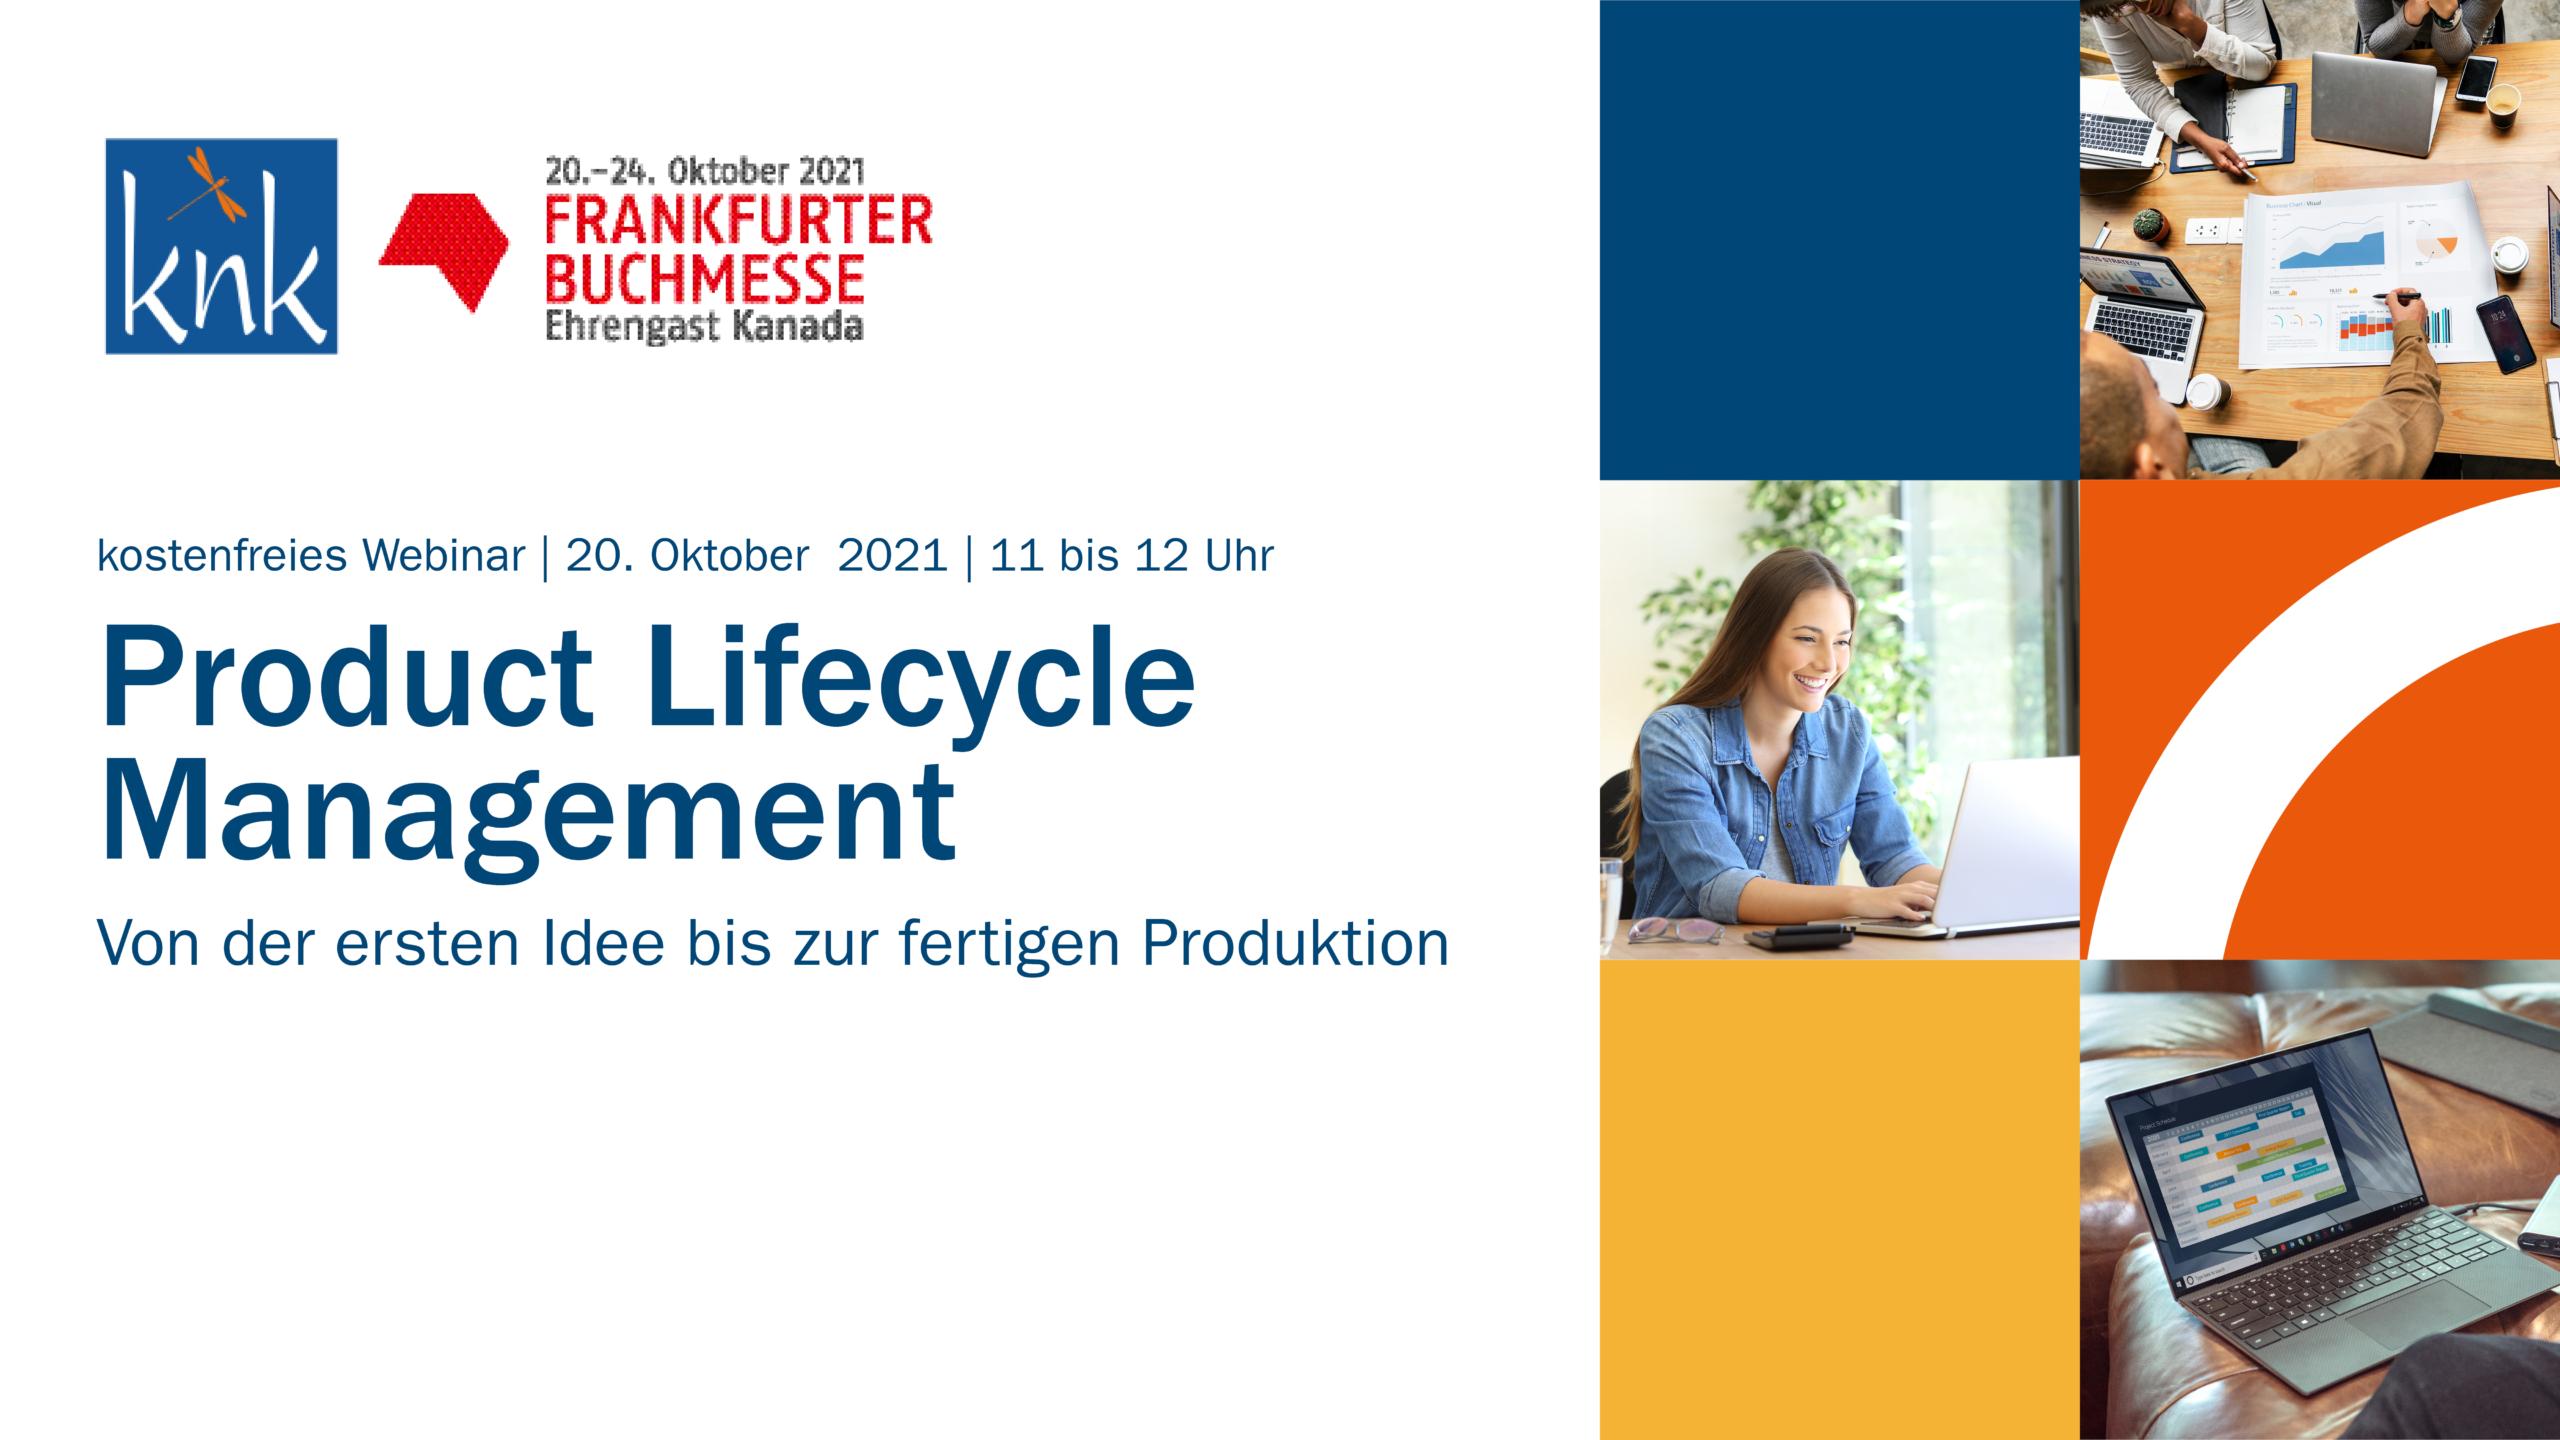 Product Lifecycle Management Webinar fbm 21